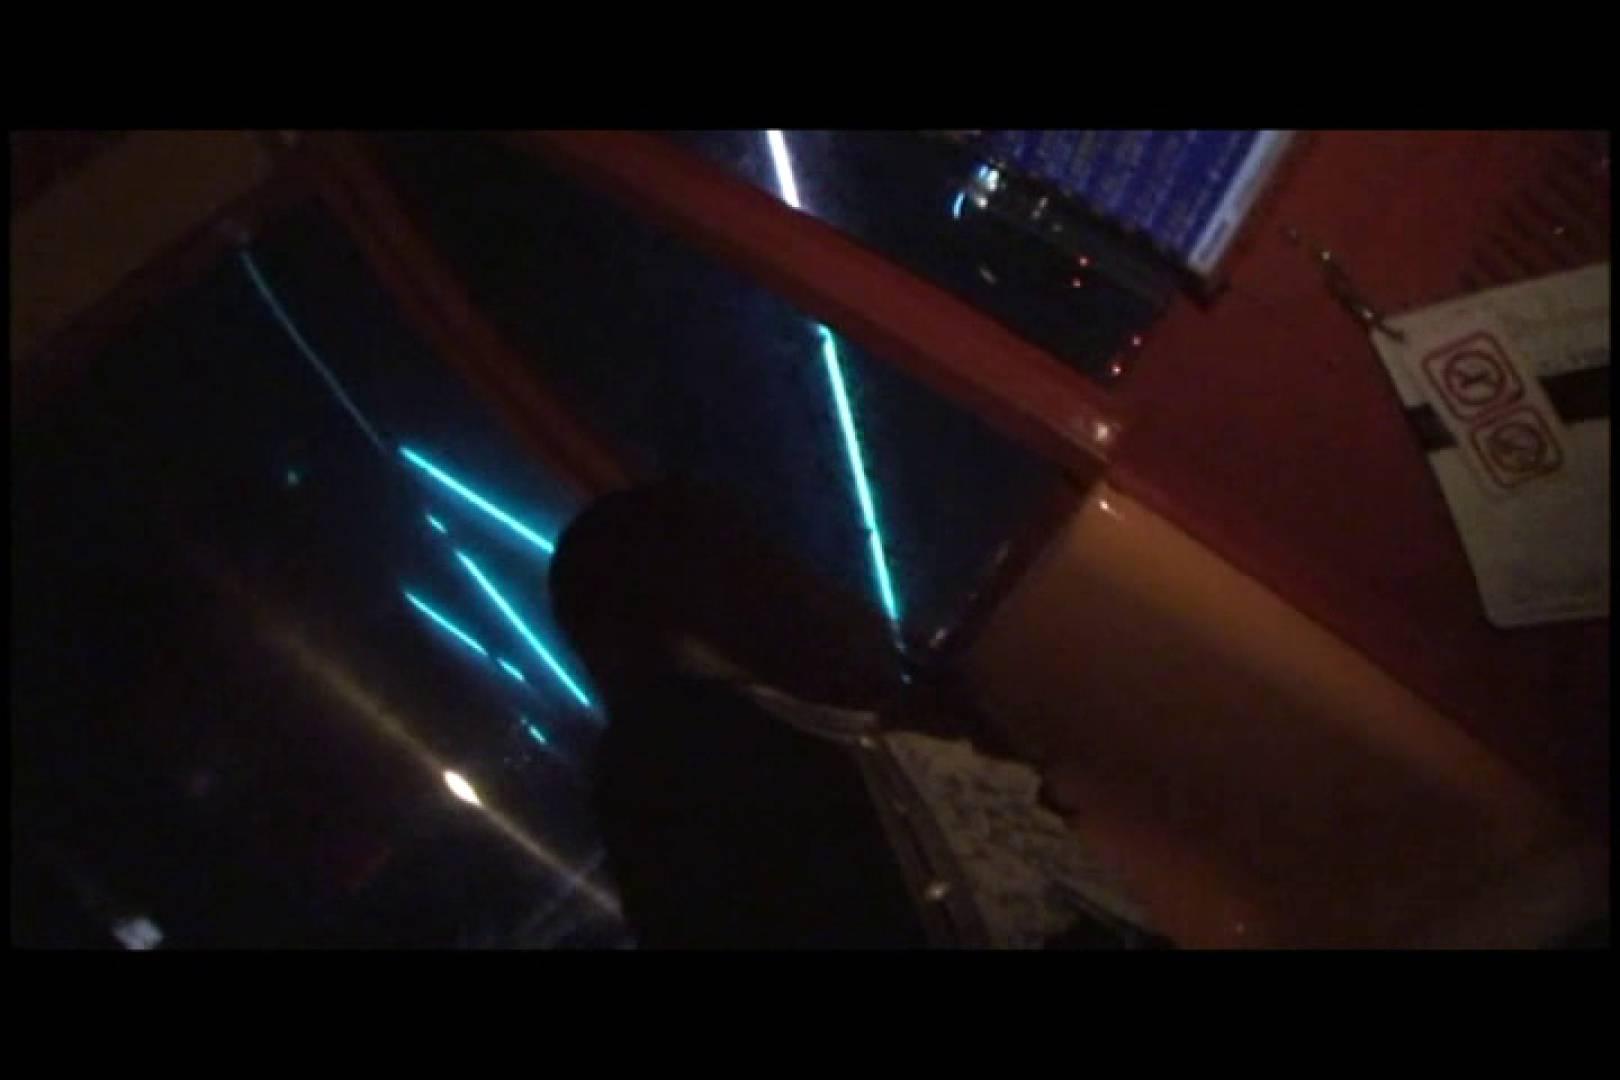 JDハンター全国ツアー vol.058 後編 女子大生のエロ動画  106PIX 40